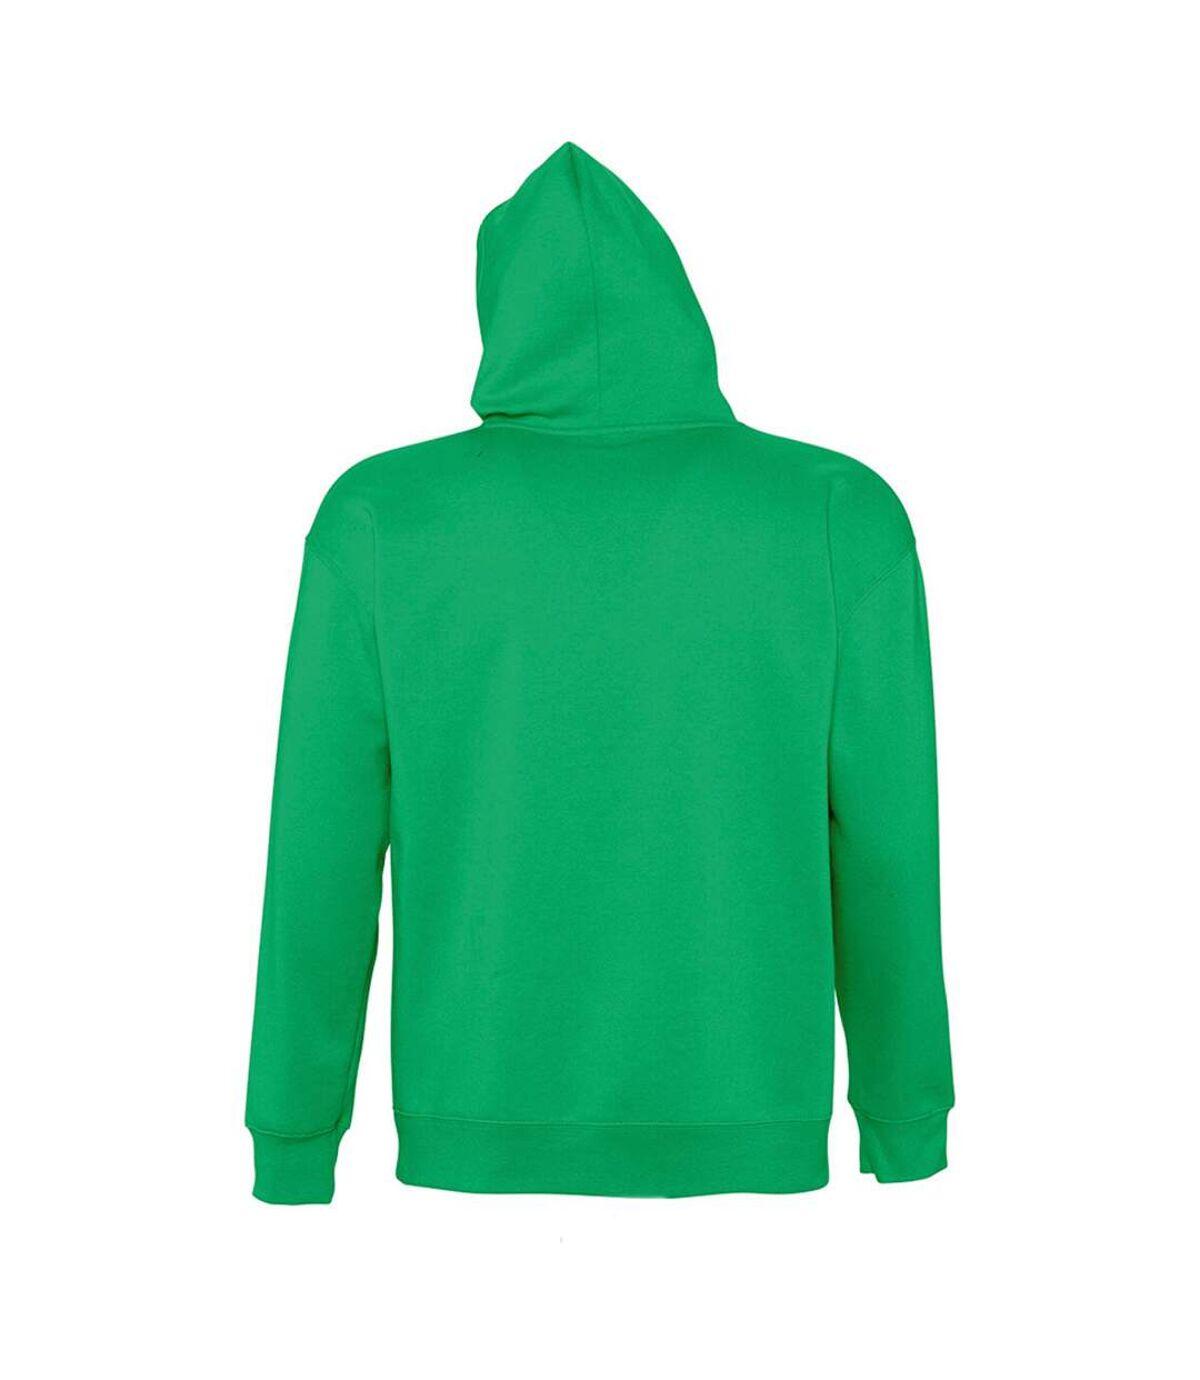 SOLS Slam - Sweatshirt à capuche - Homme (Bleu roi) - UTPC381